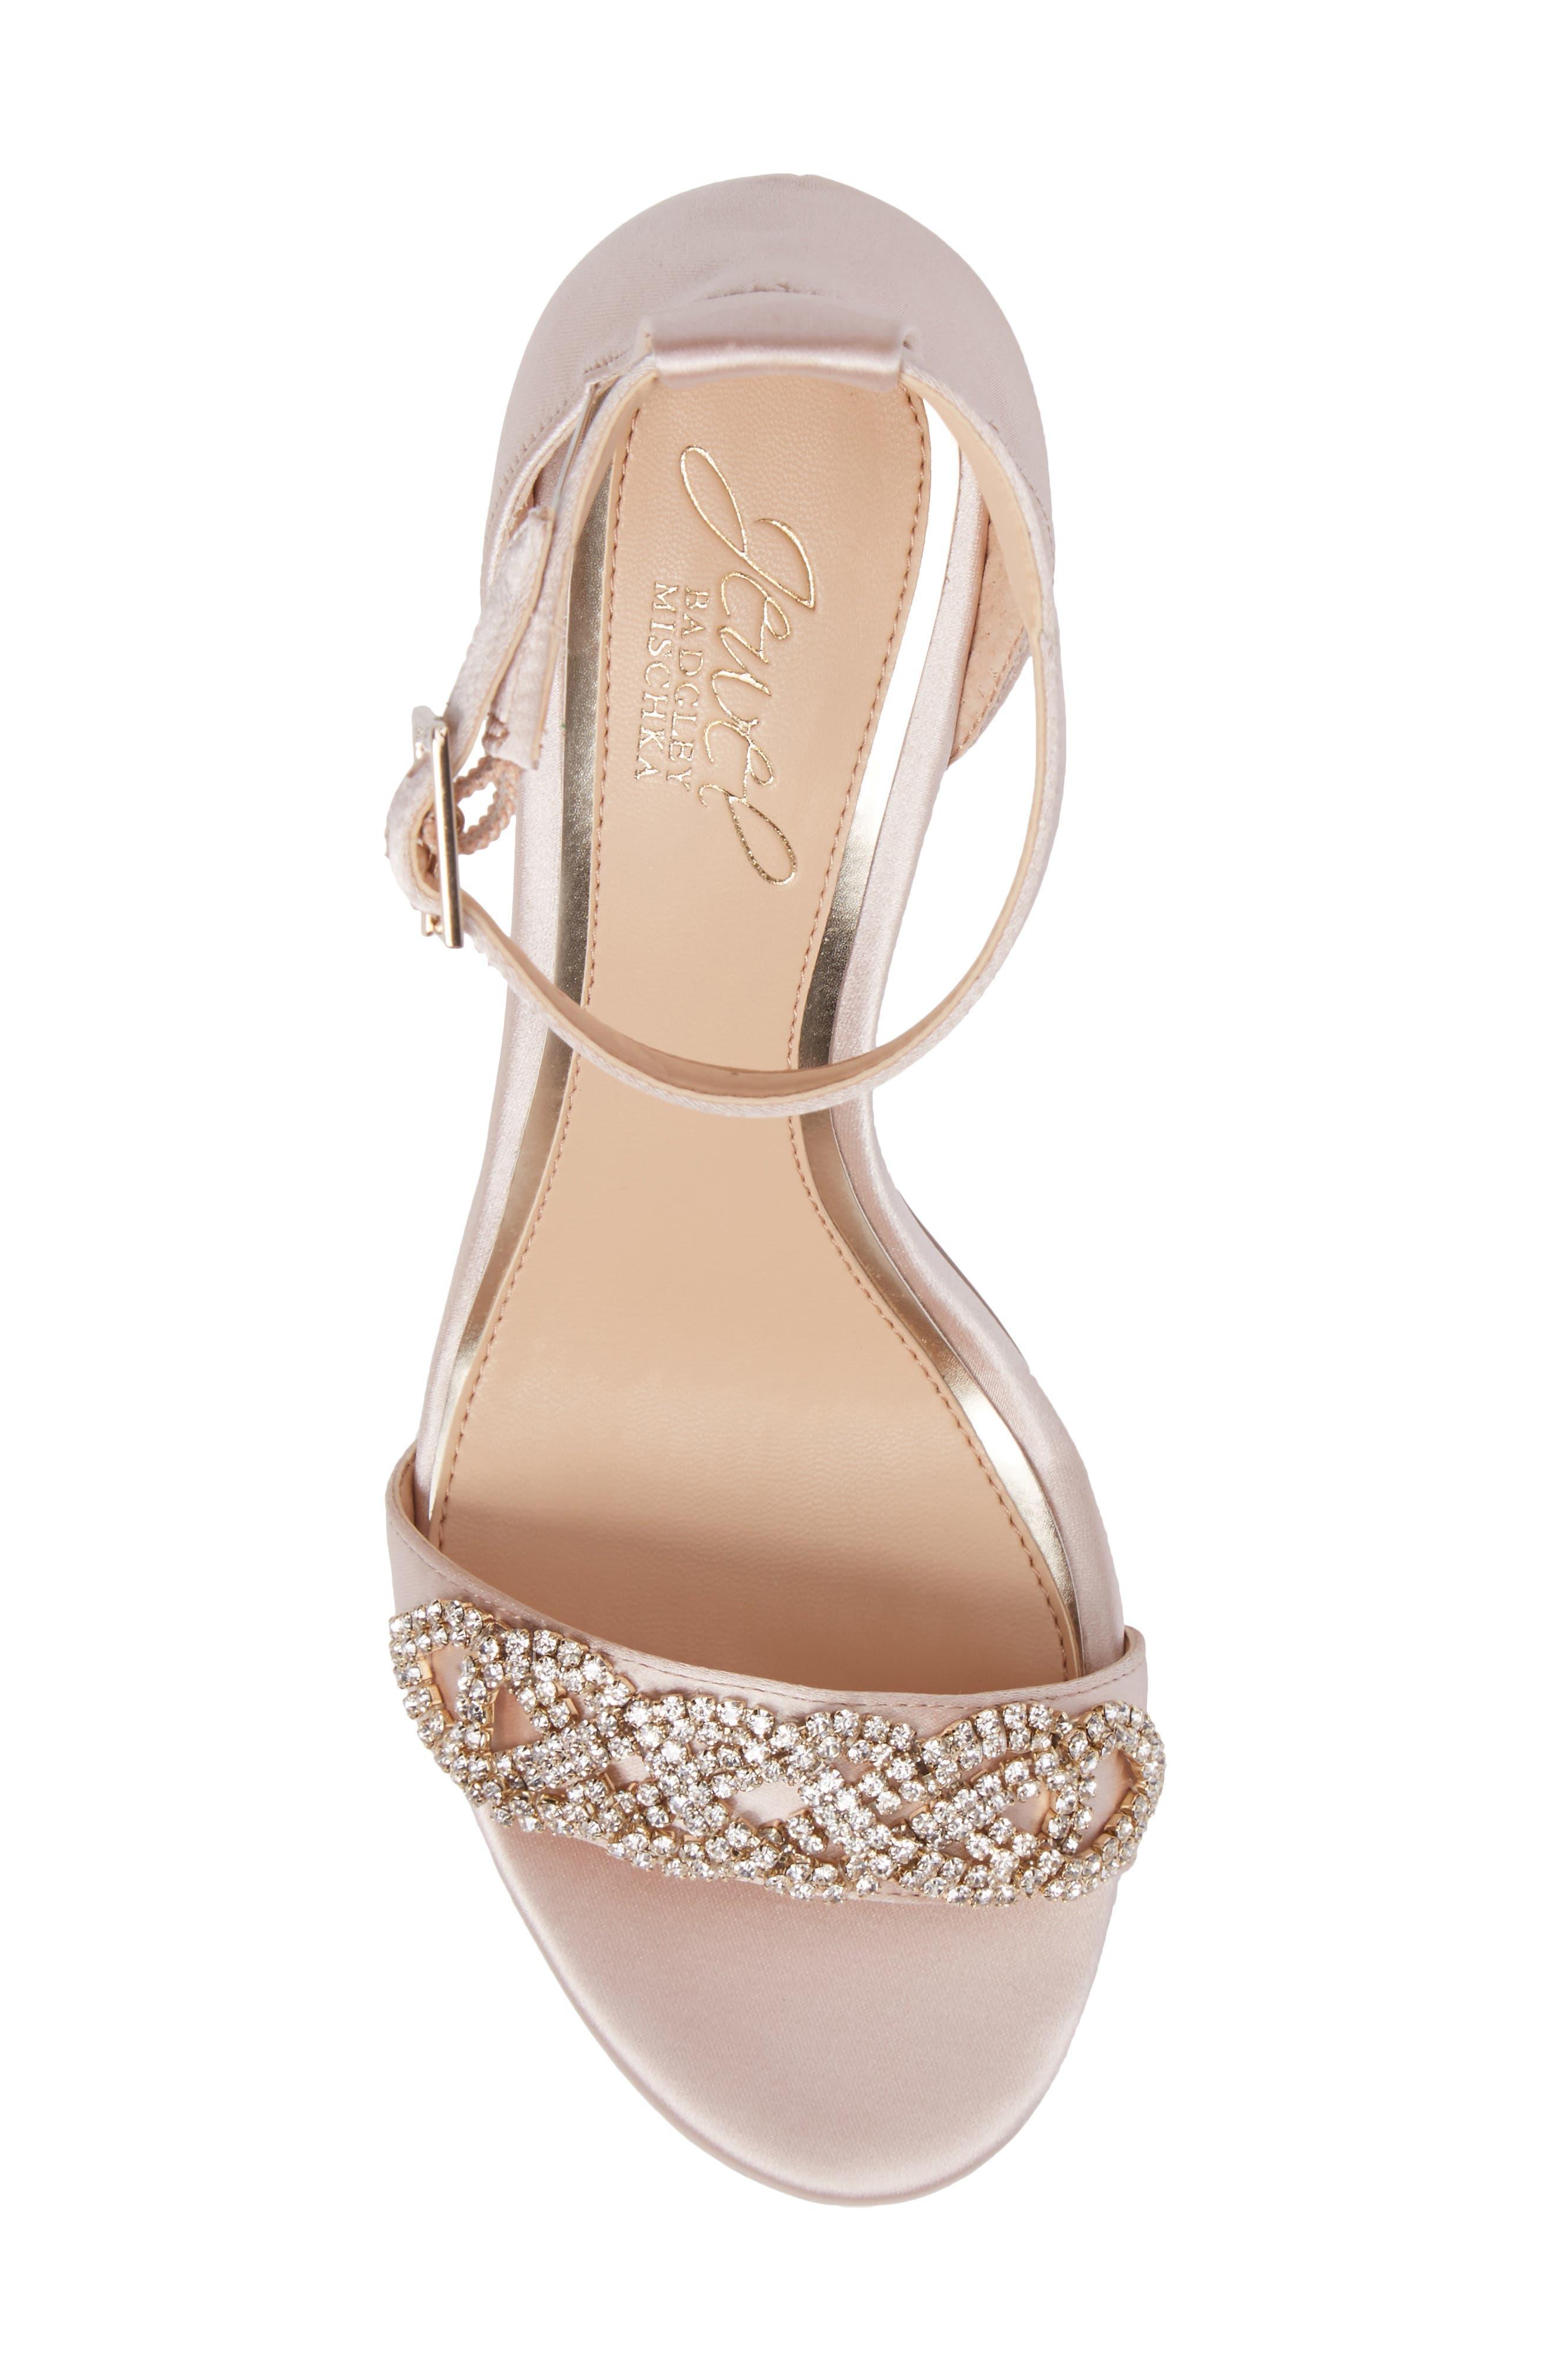 Alana Ankle Strap Sandal,                             Alternate thumbnail 5, color,                             Champagne Satin